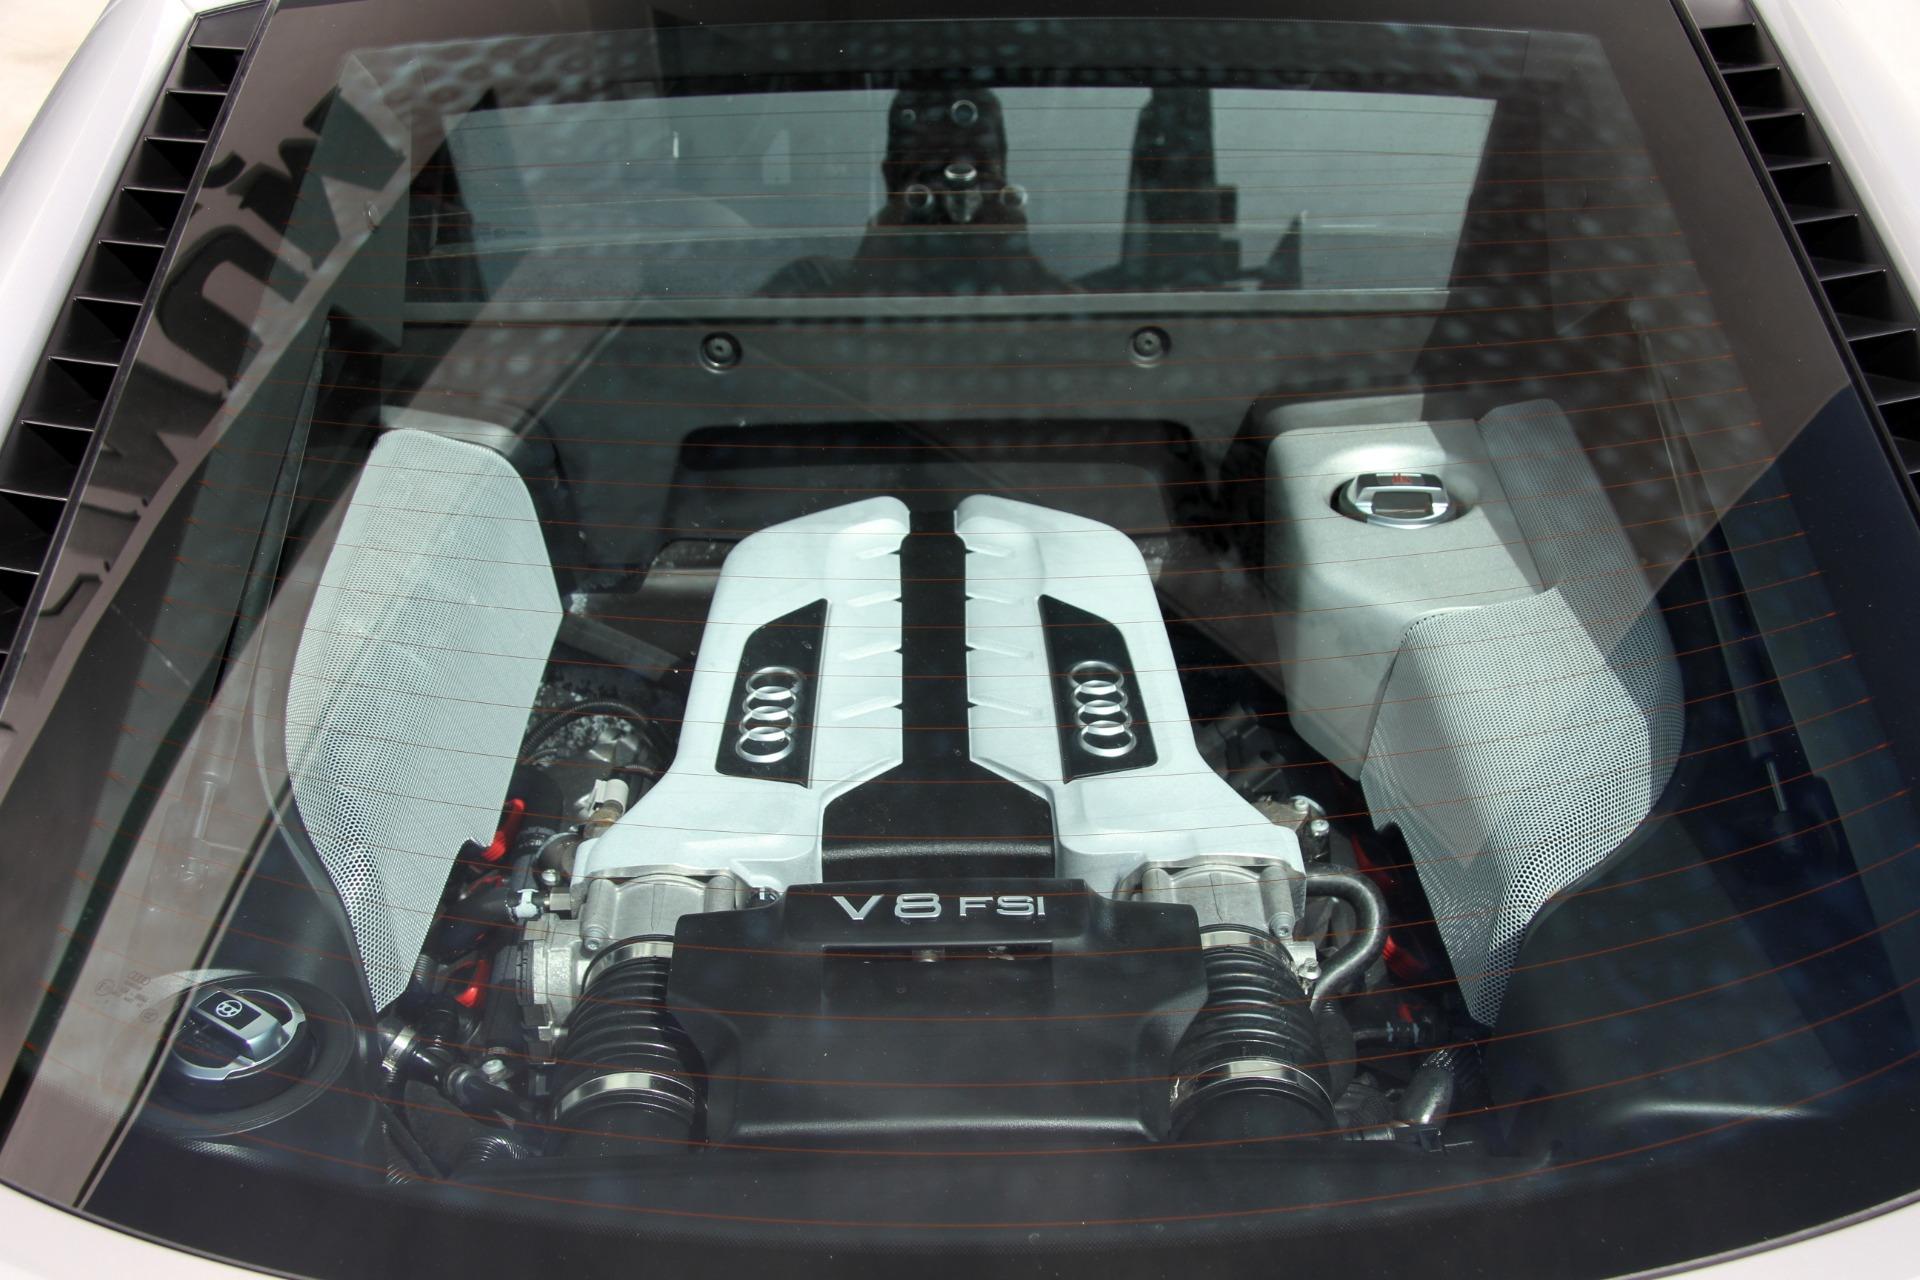 Audi Dealership Near Me >> 2012 Audi R8 4.2 quattro *** RARE MANUAL TRANSMISSION *** Stock # 6150 for sale near Redondo ...